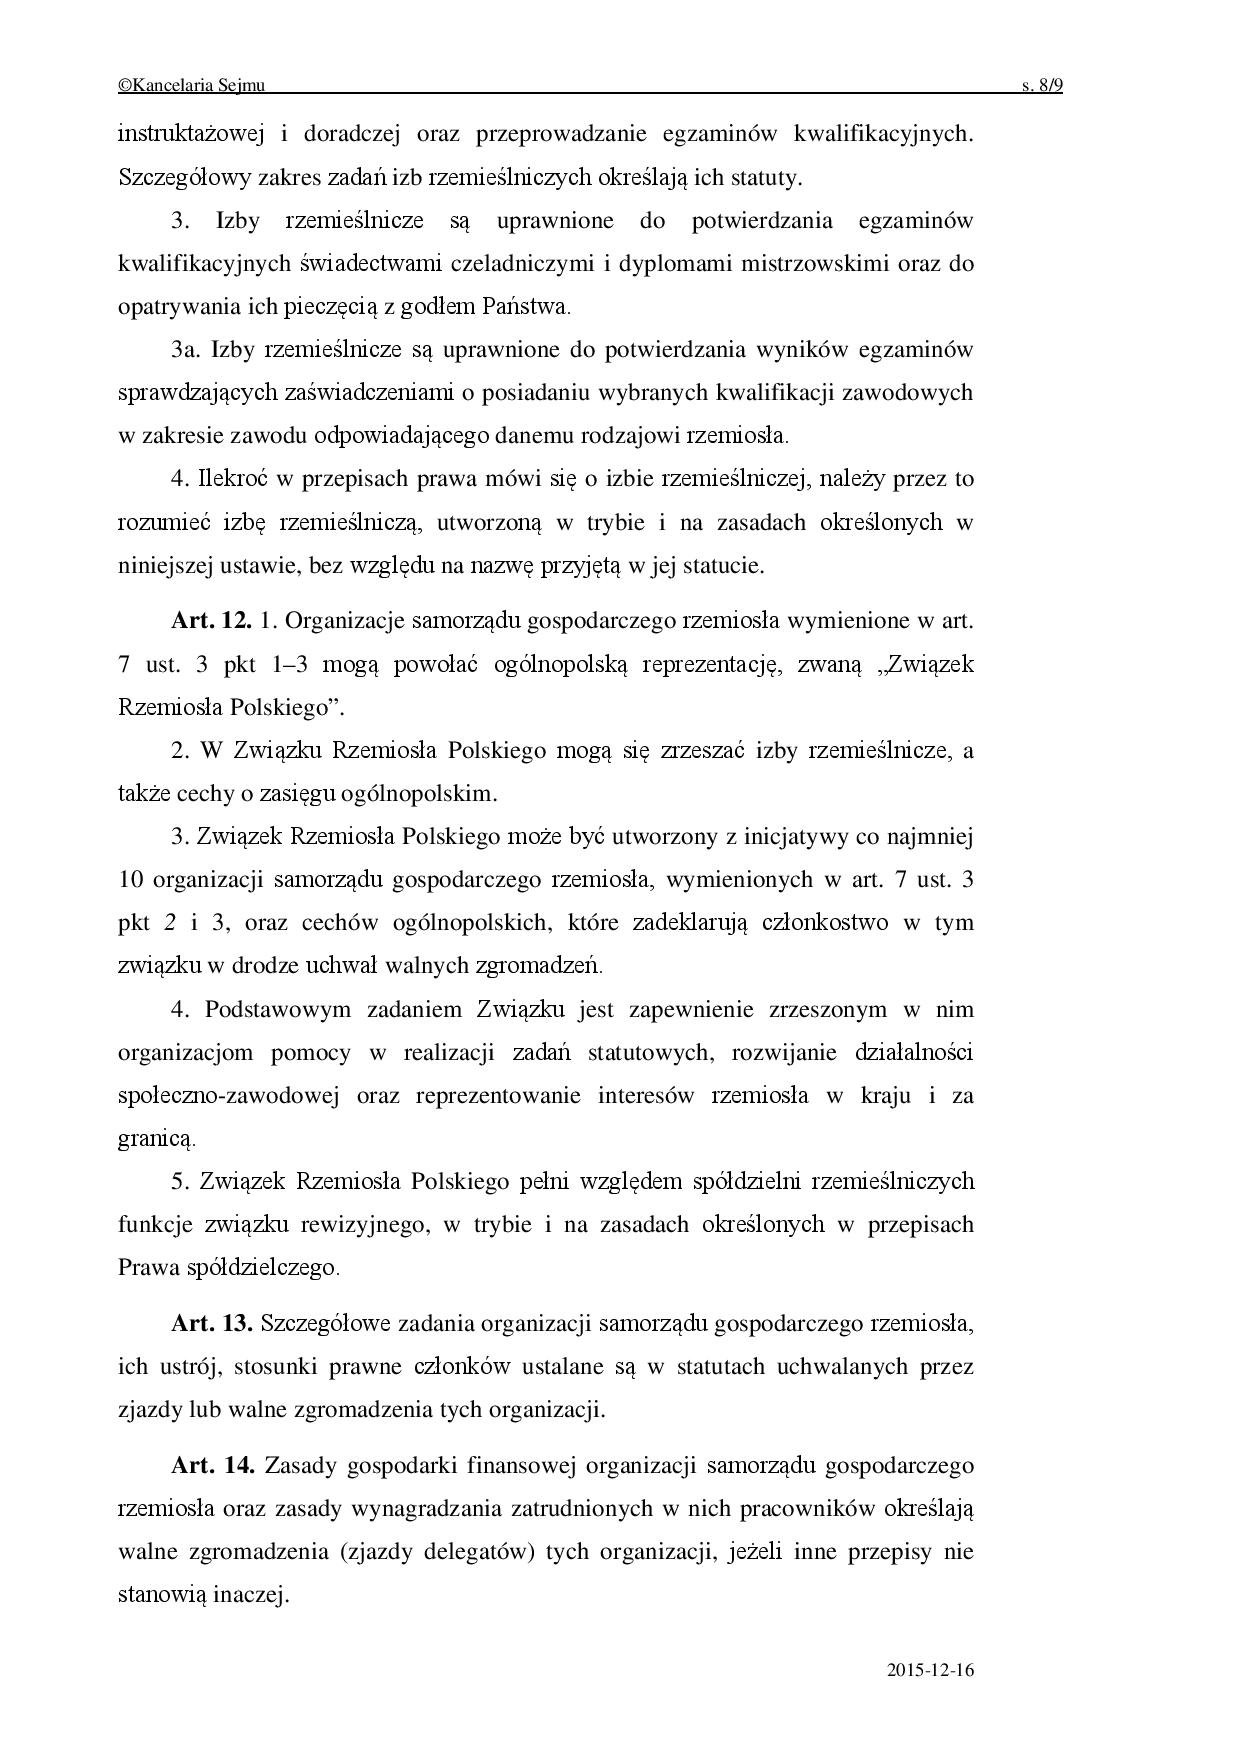 D19890092Lj-page-008